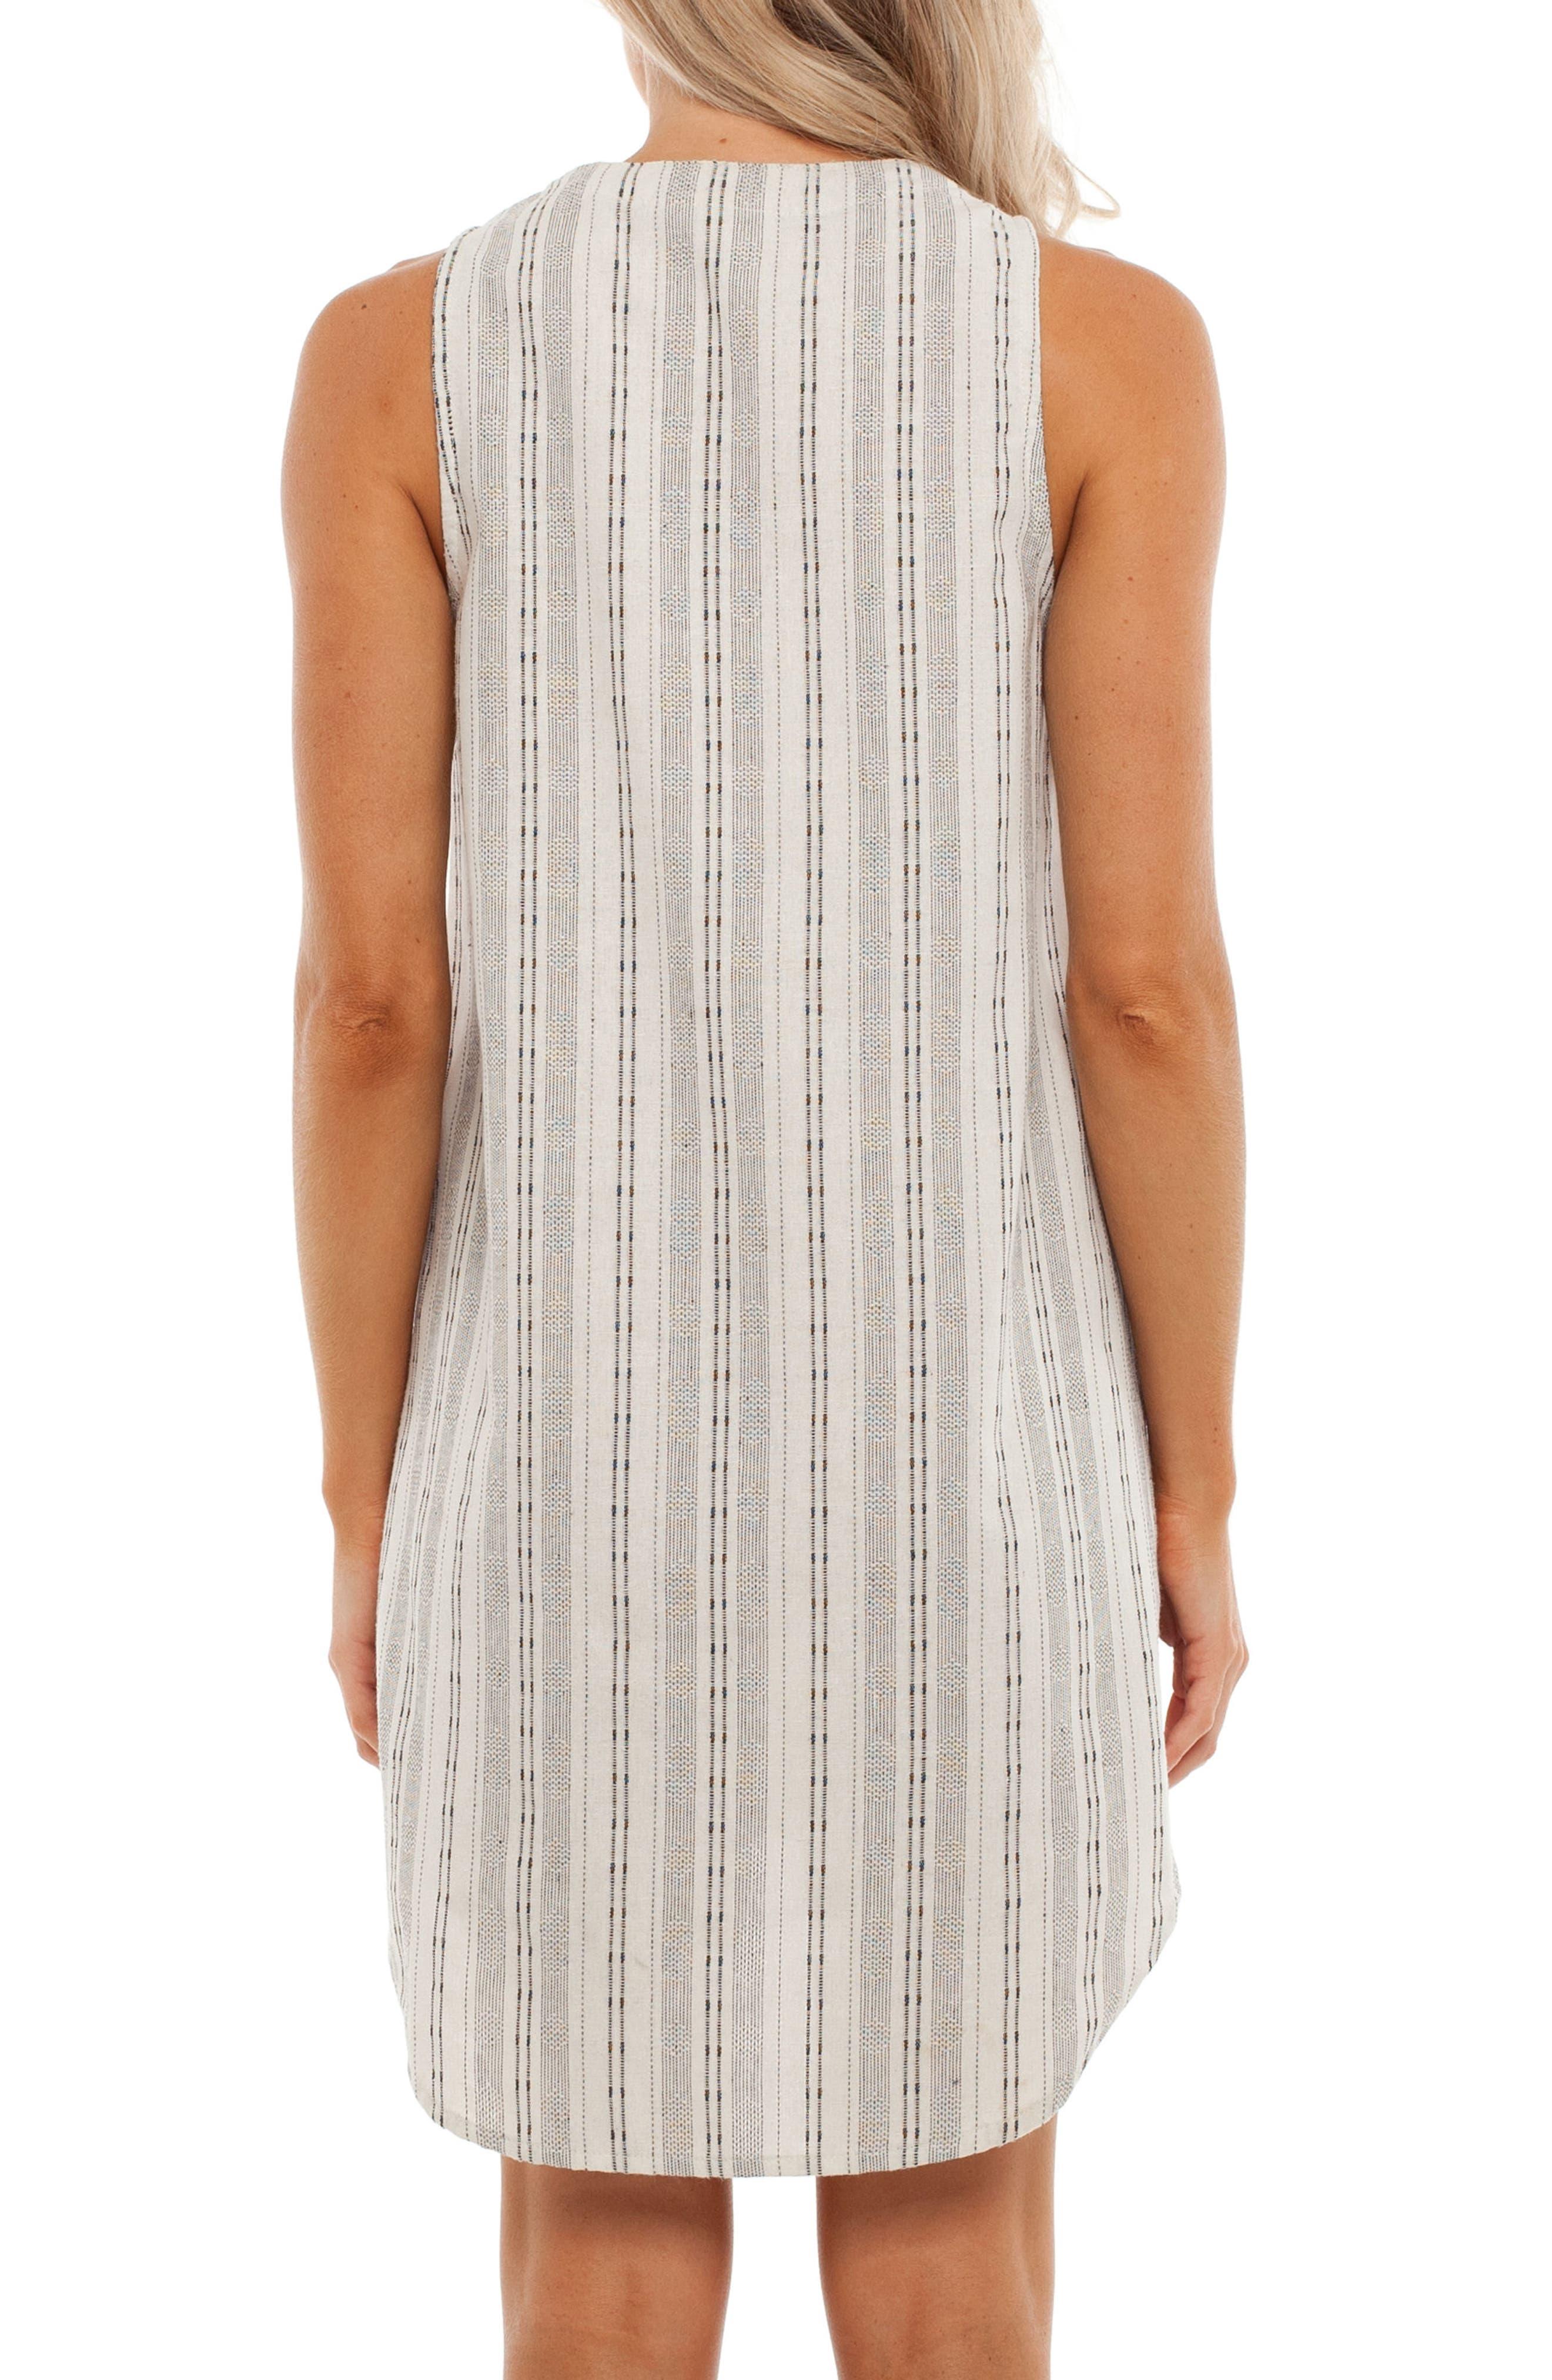 Panama Cover-Up Dress,                             Alternate thumbnail 2, color,                             White